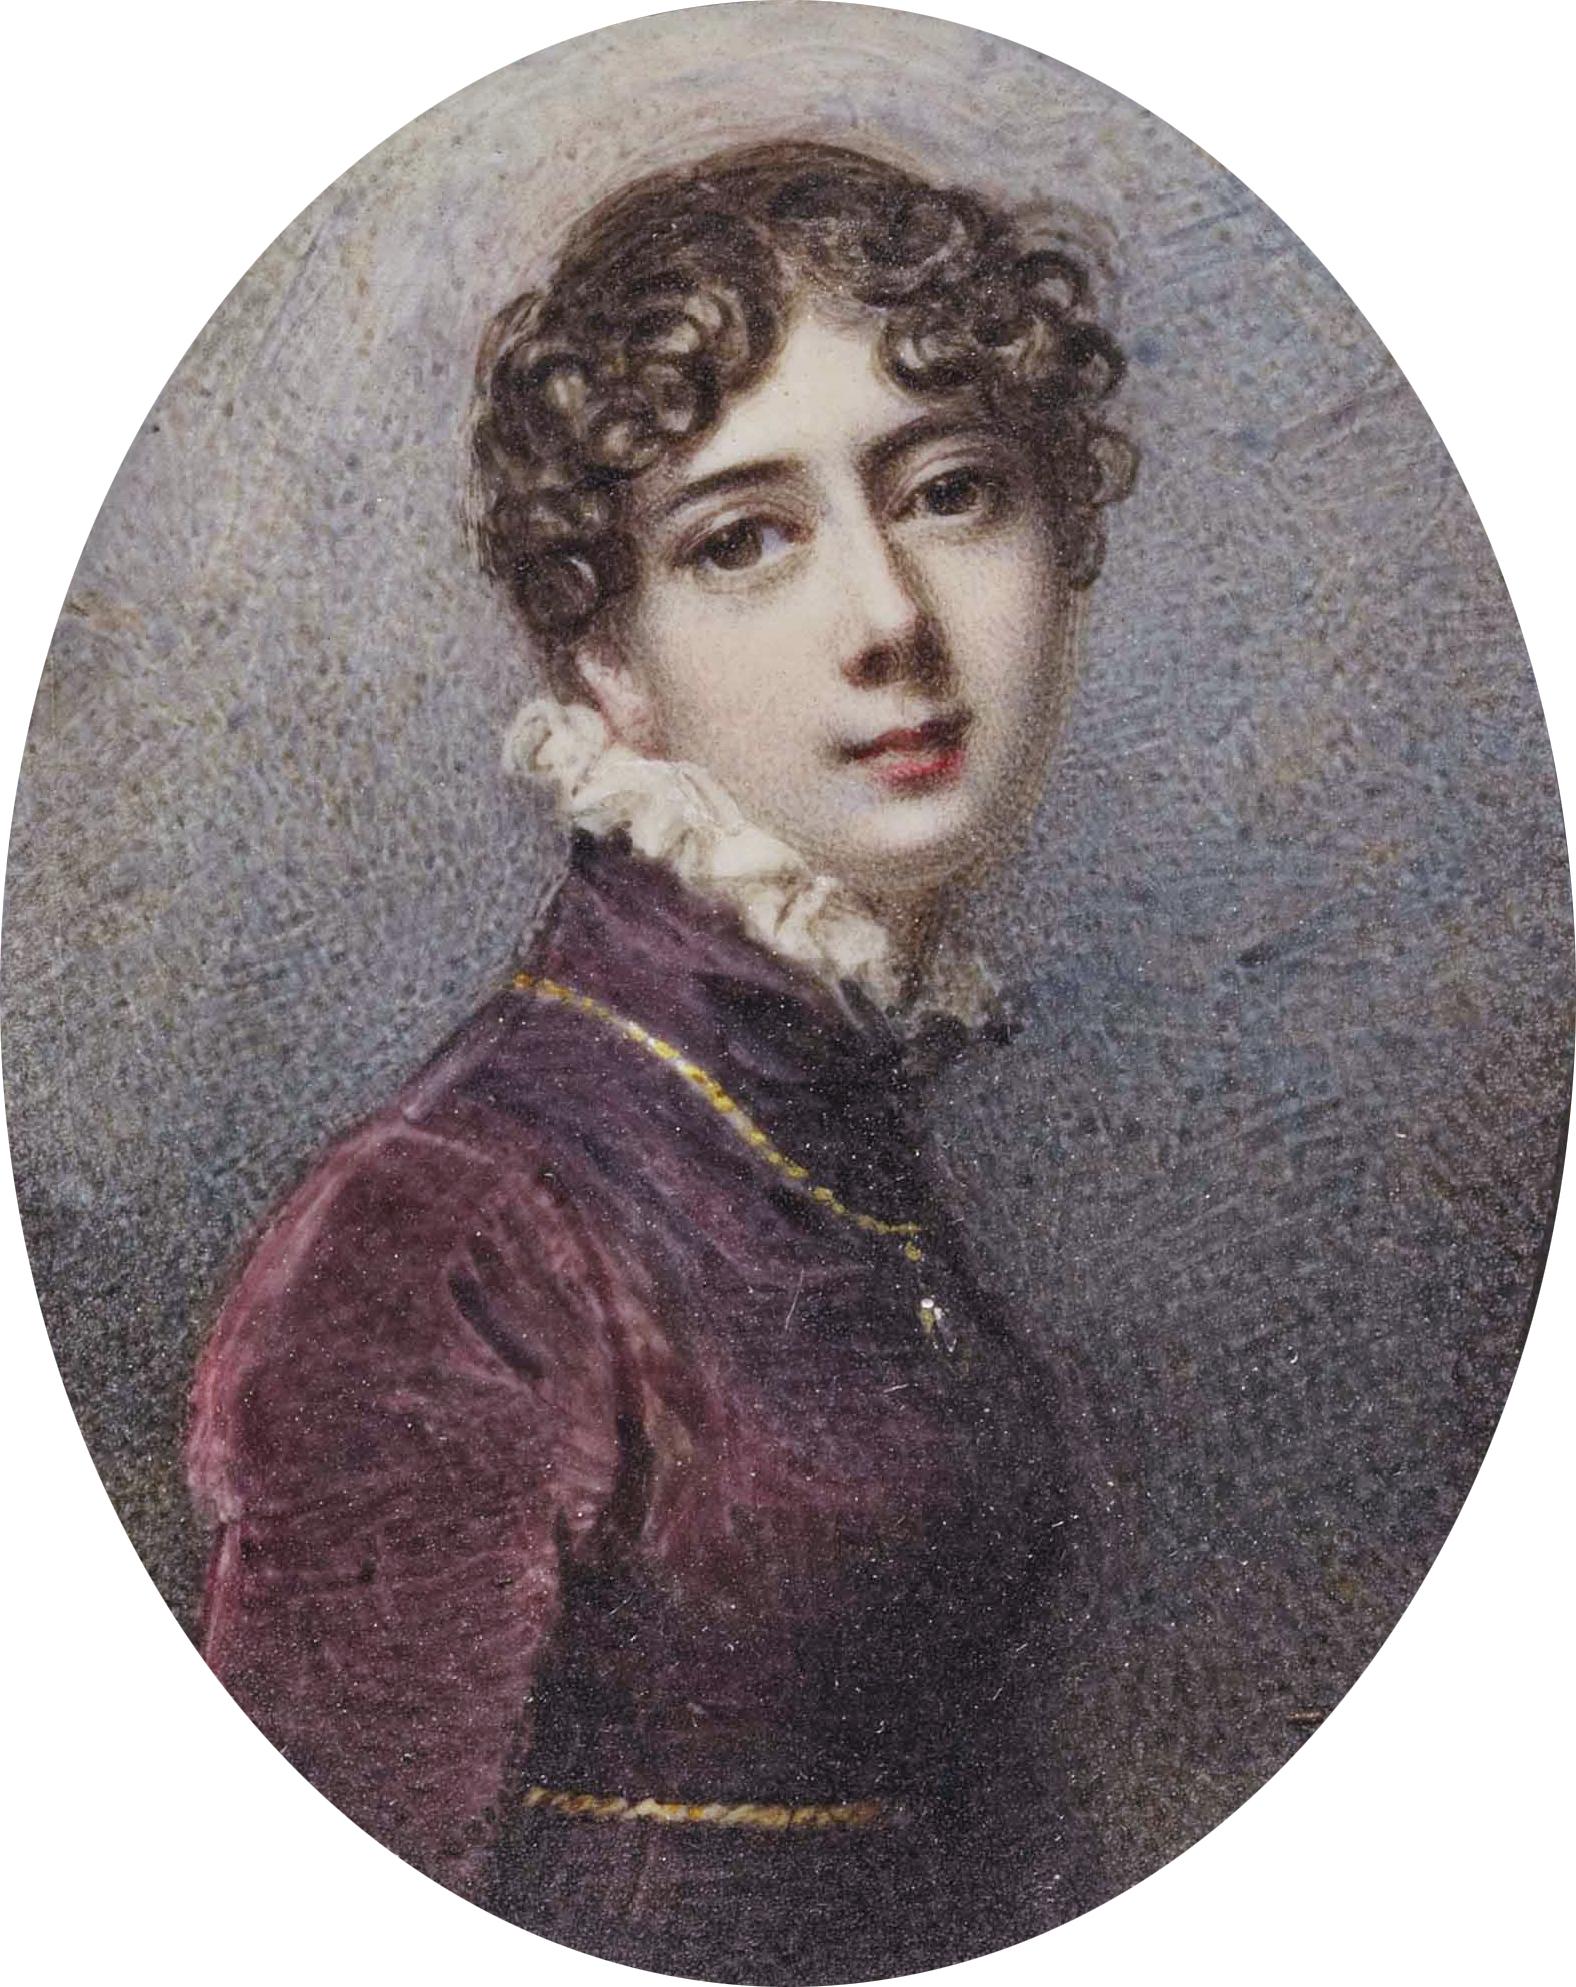 Charlotte_Townshend_(1776-1856),_by_Anne_Mee_nee_Foldsone